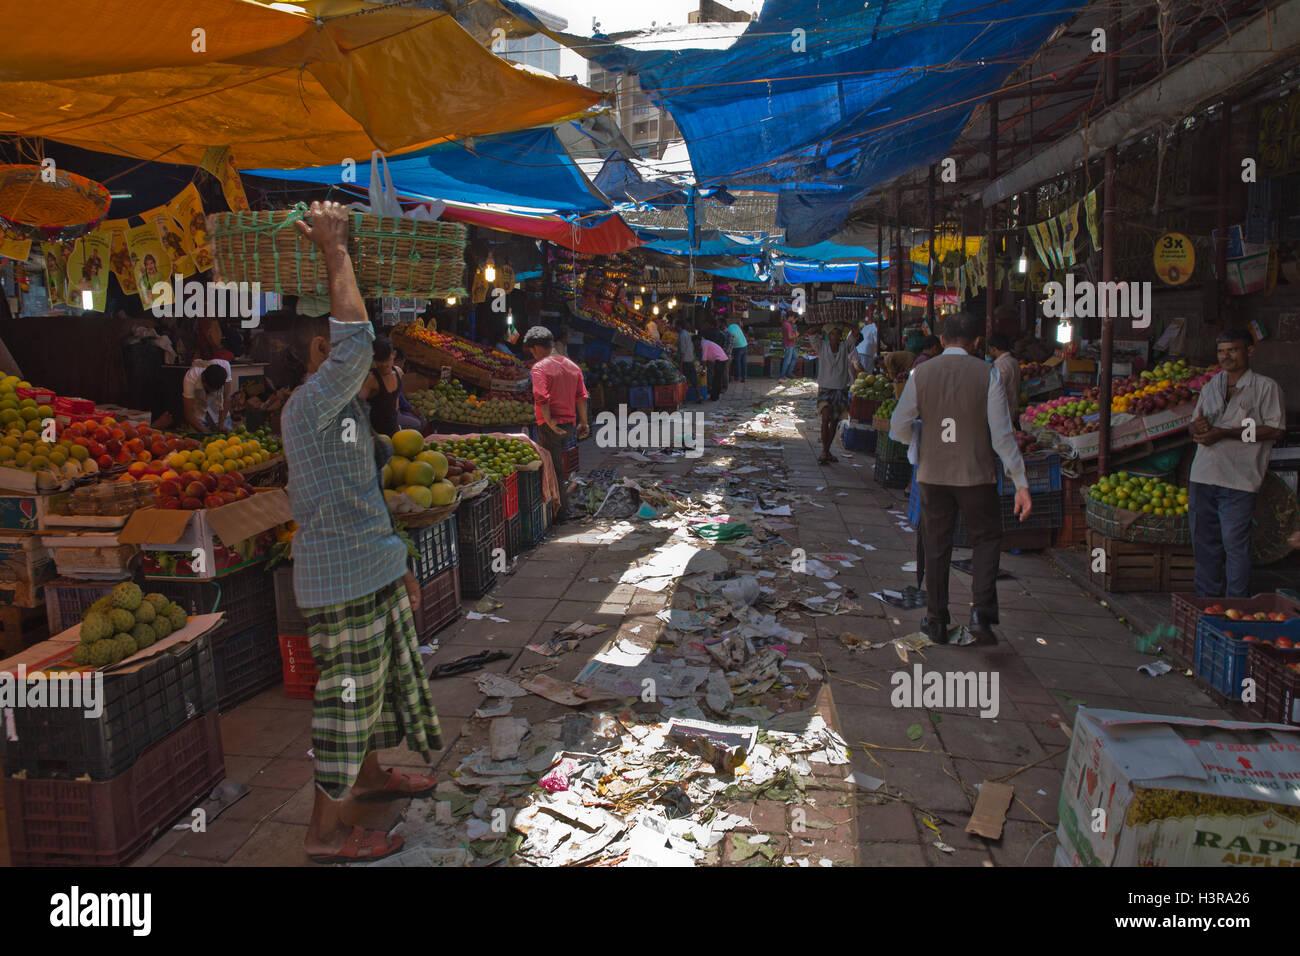 Vendors in Crawford Market - Stock Image